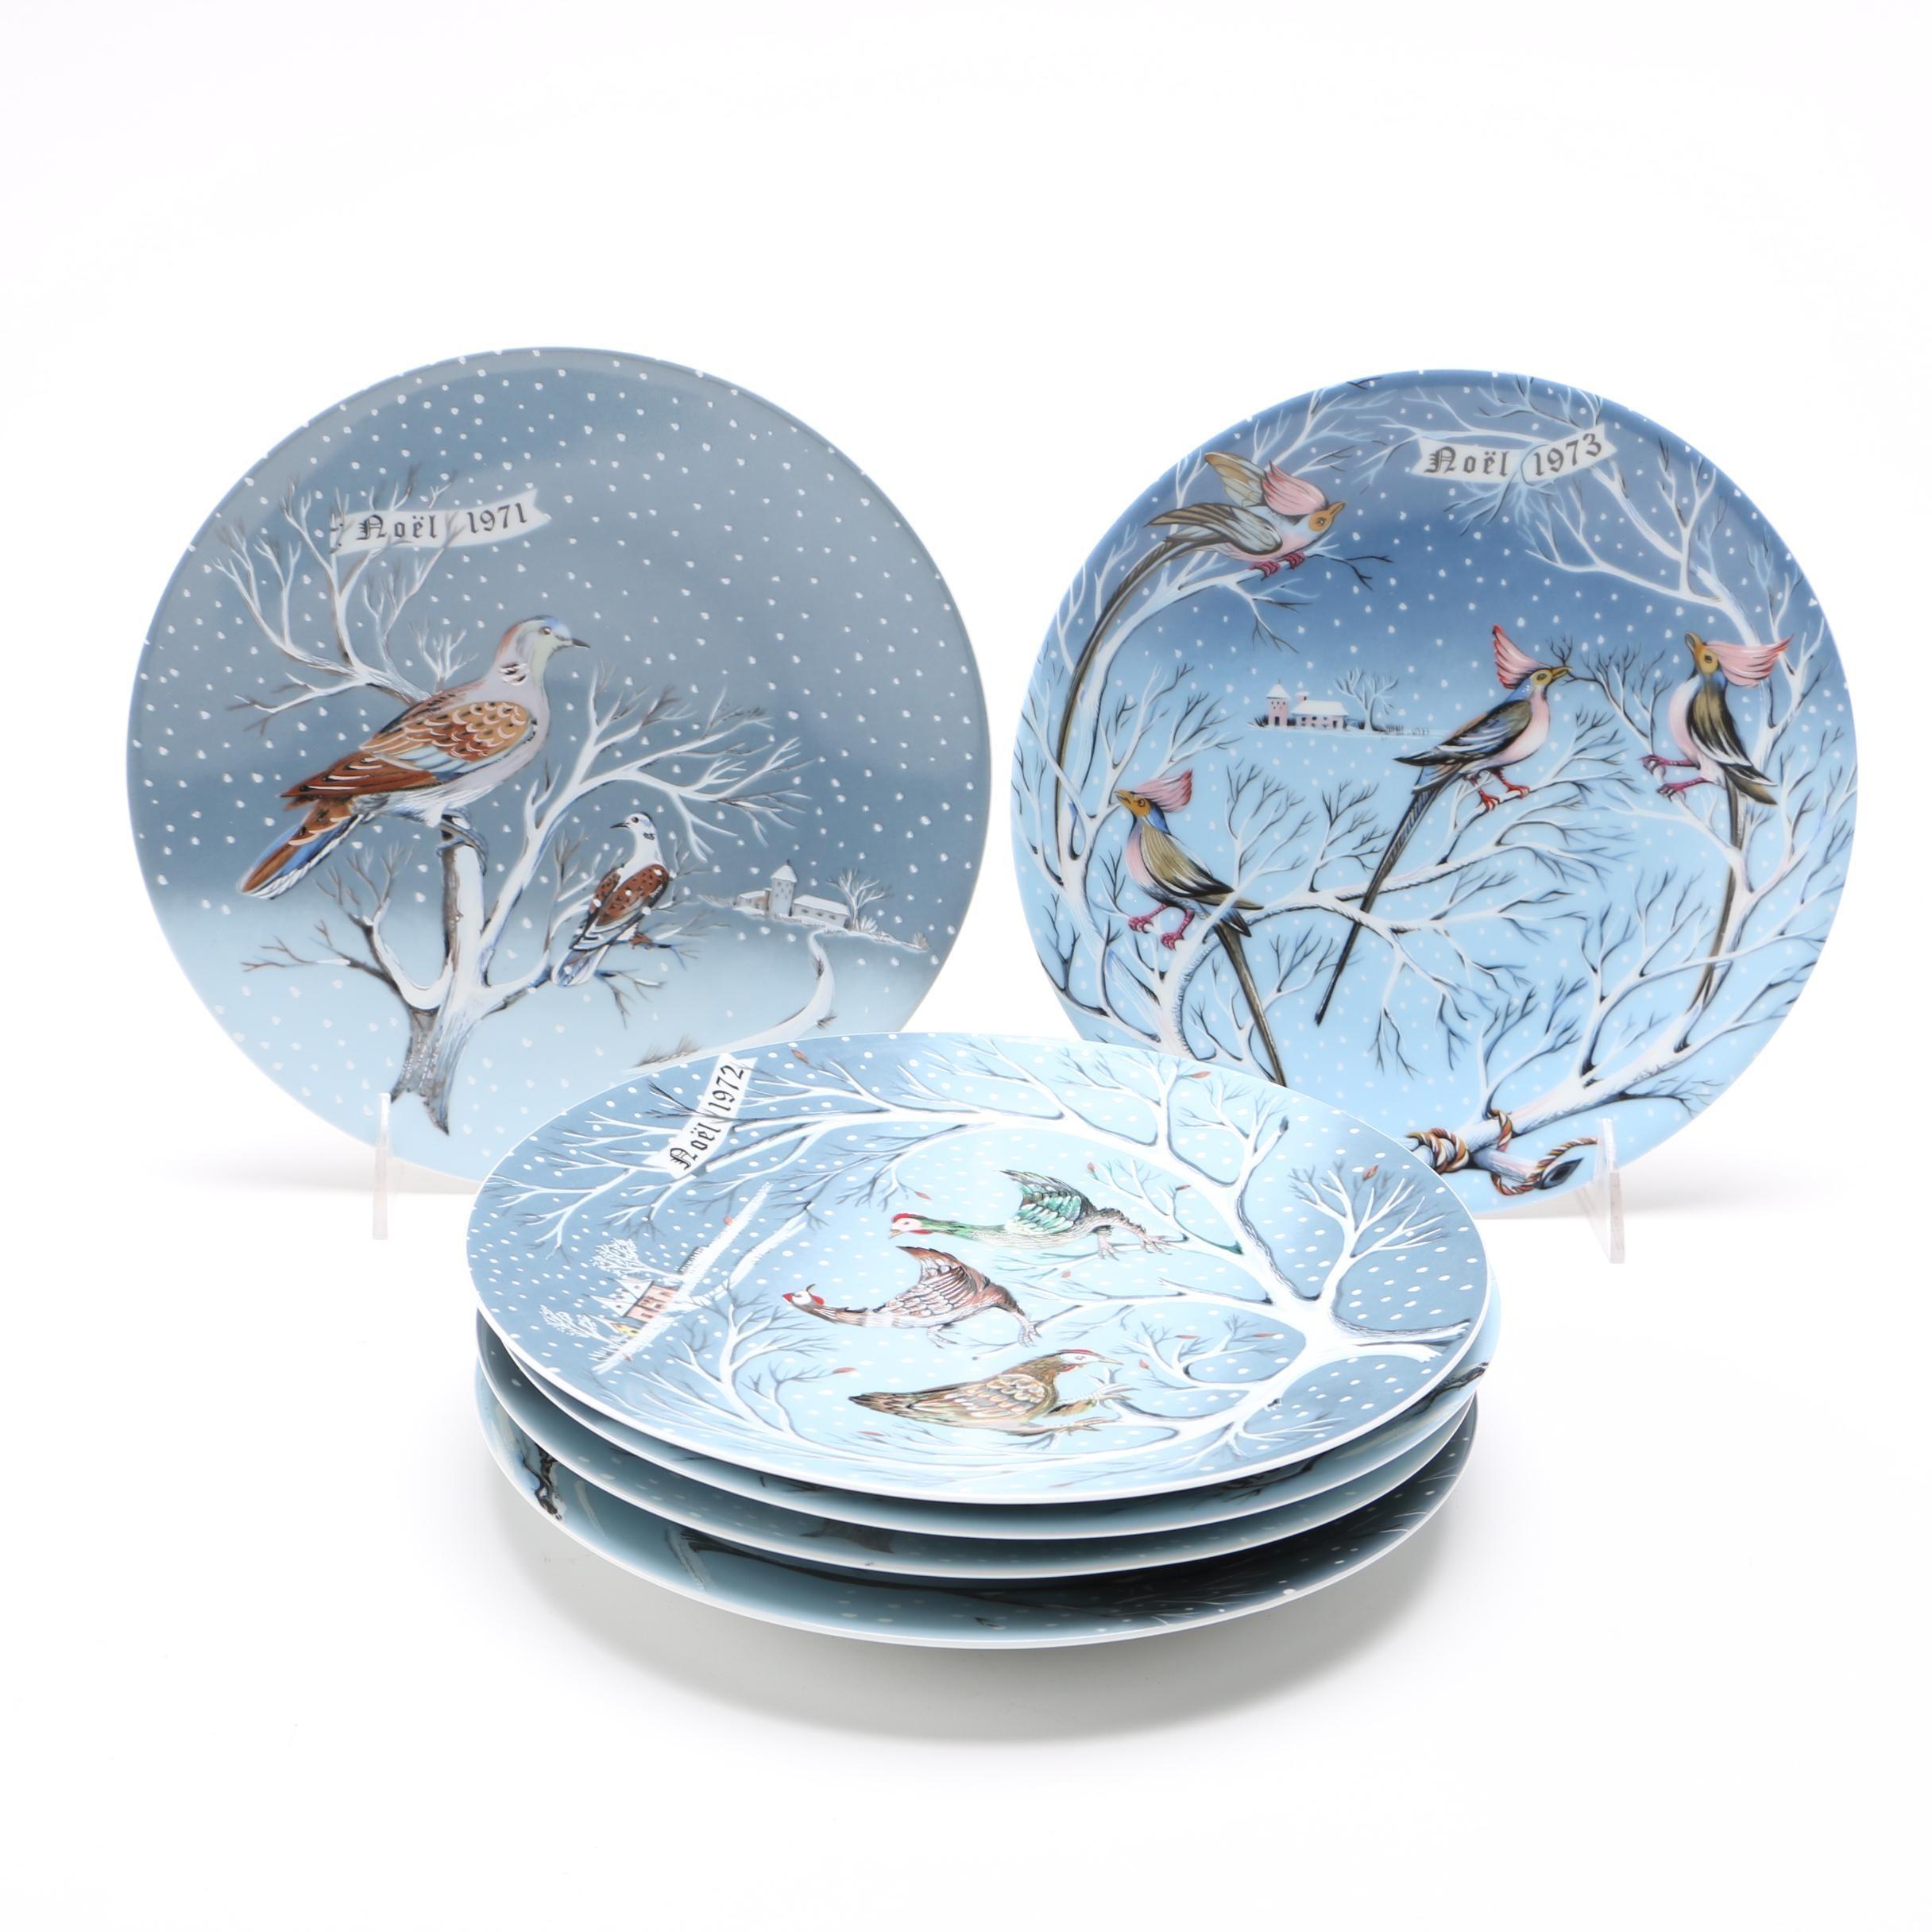 "Haviland Limoges ""The Twelve Days of Christmas"" Plates"